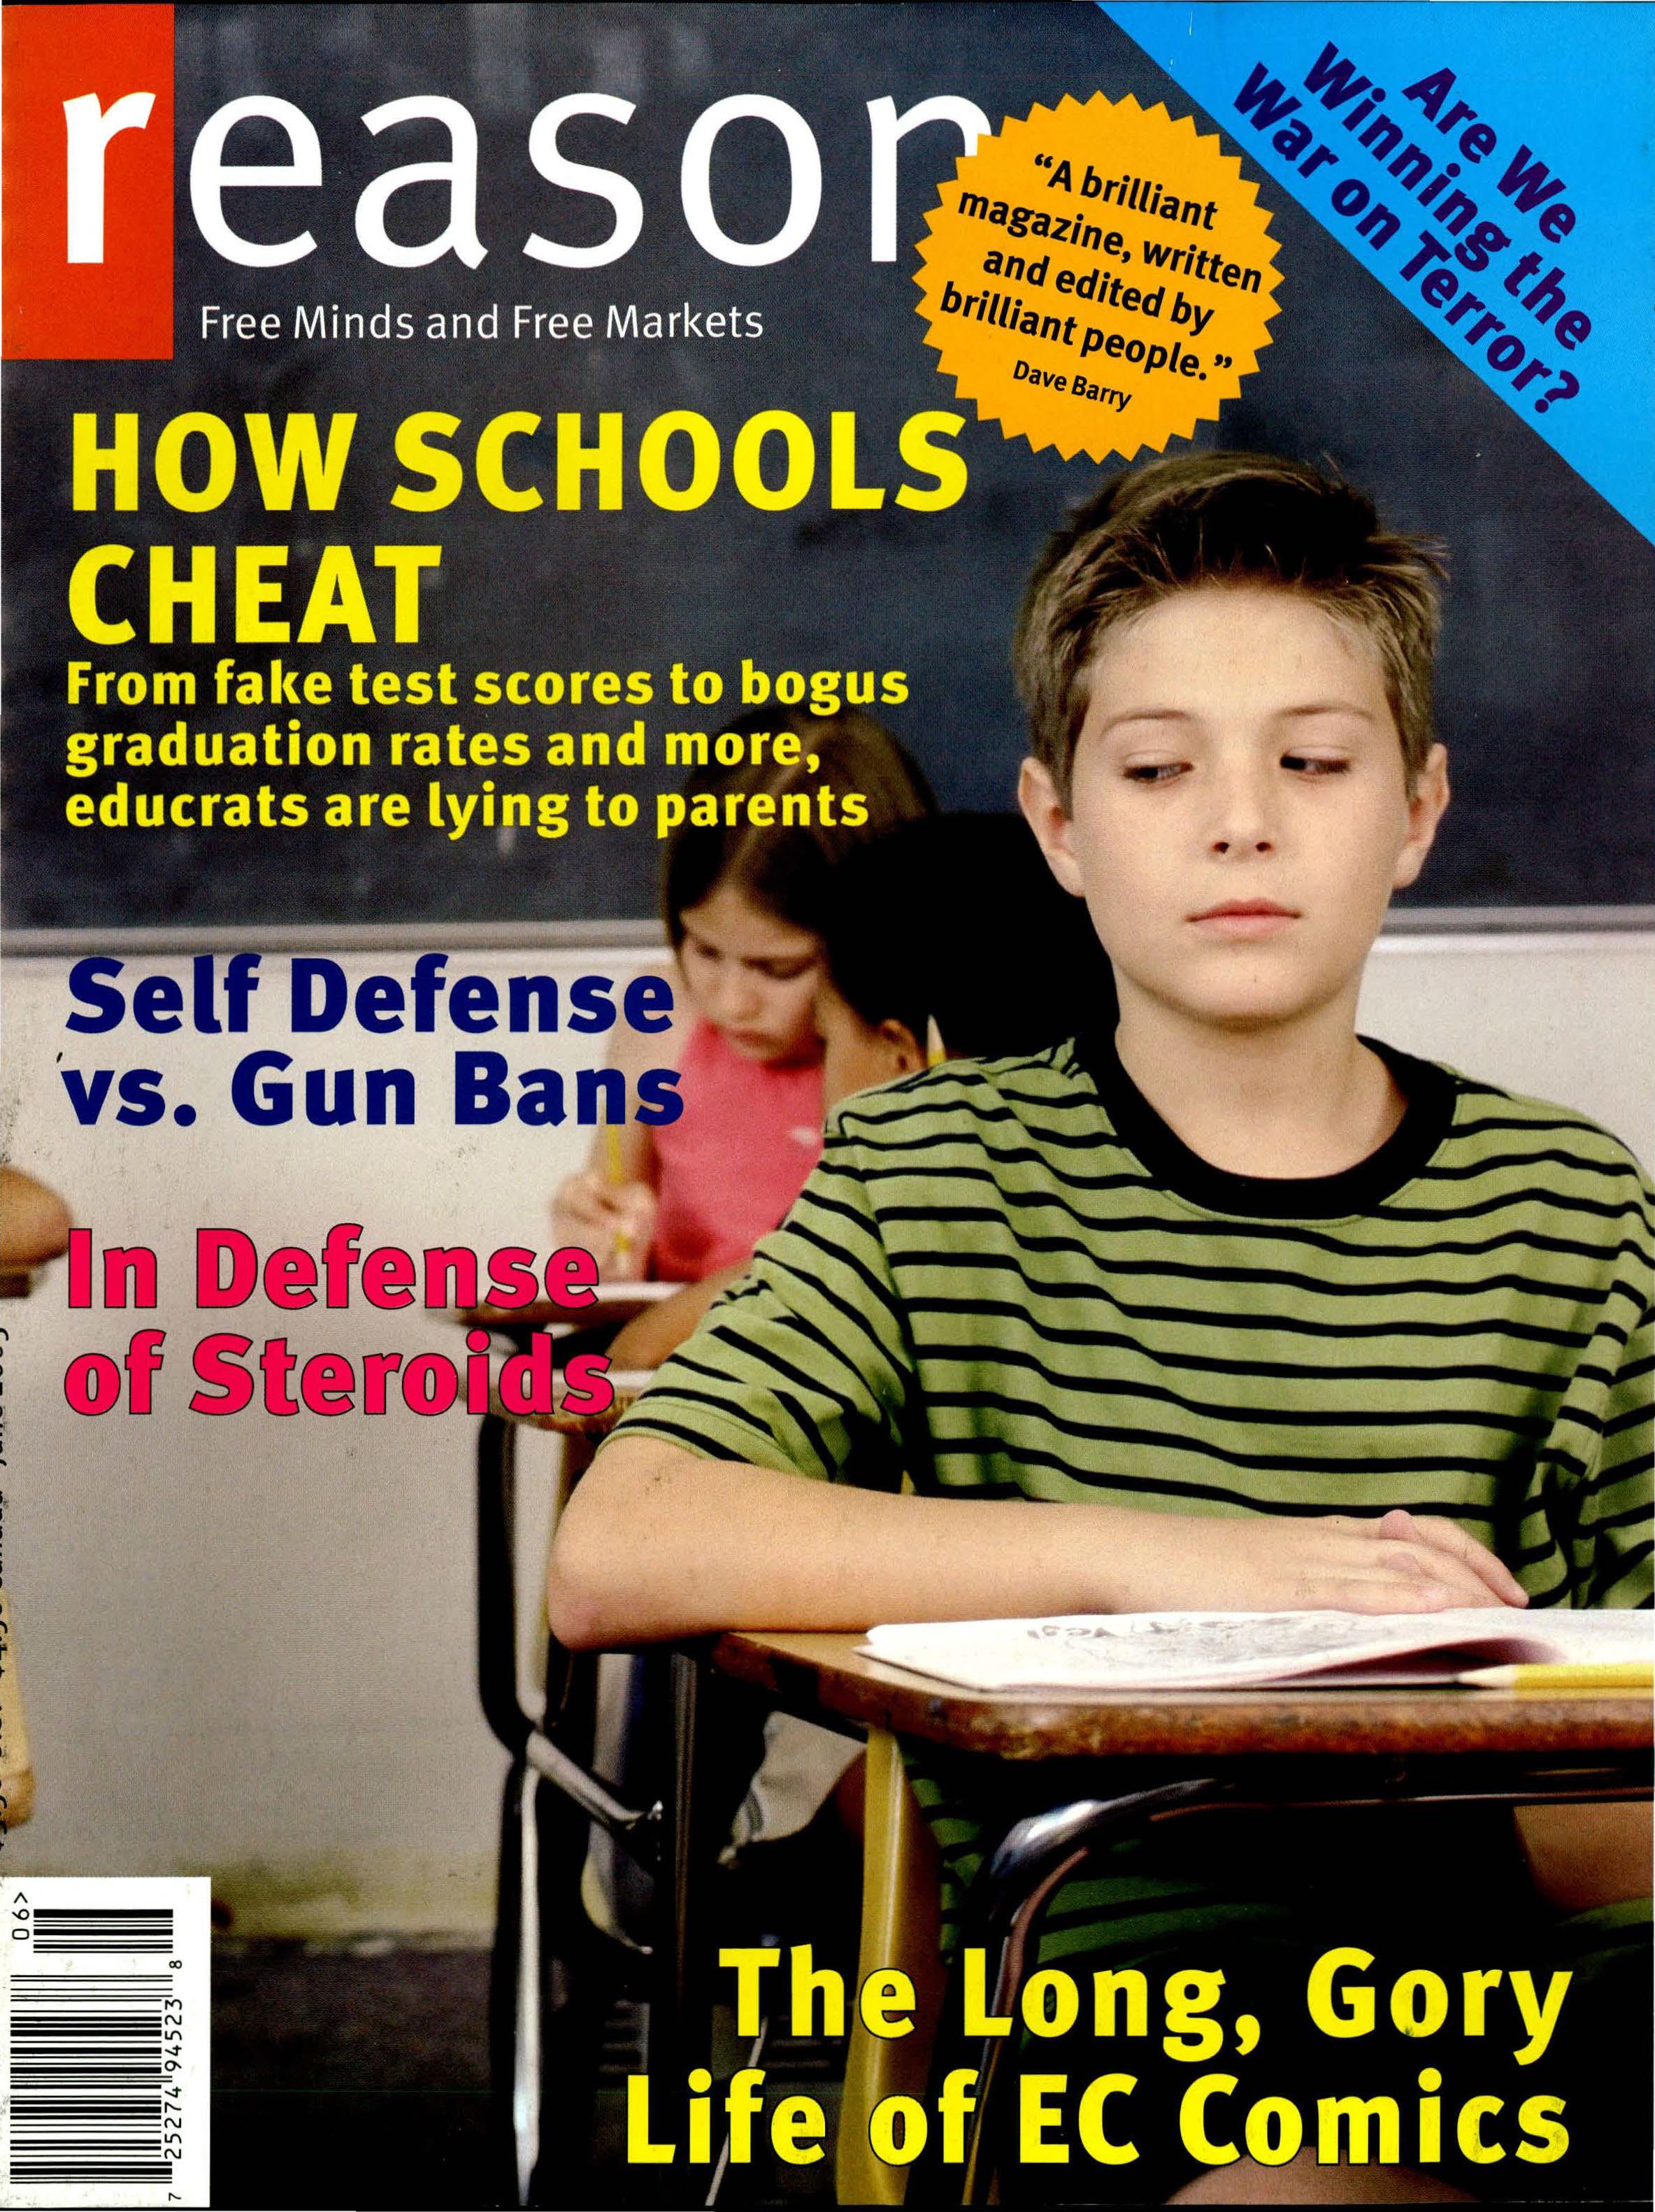 Reason Magazine, June 2005 cover image